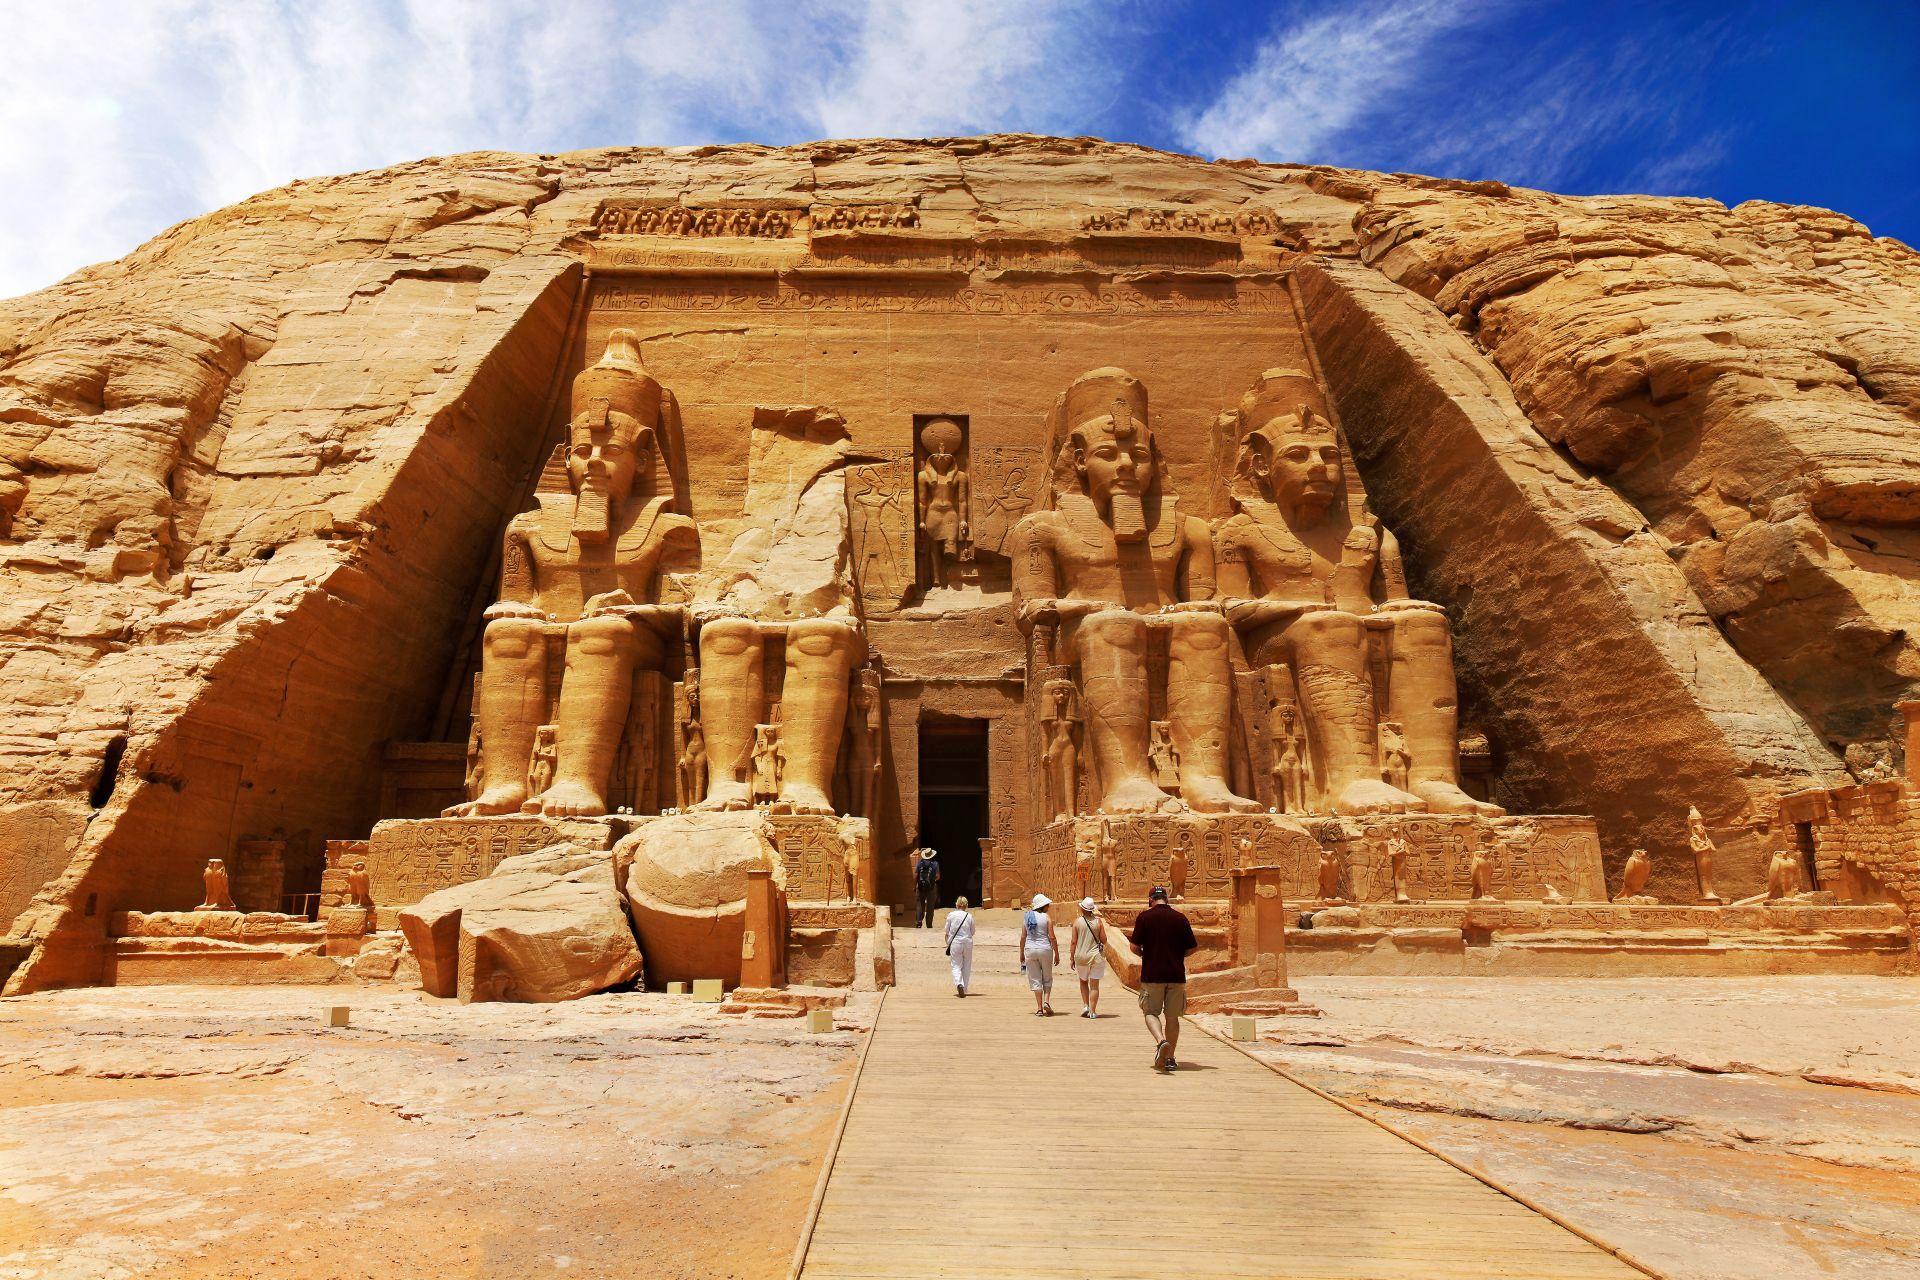 Abu Simbel entdecken auf Aegypten.de